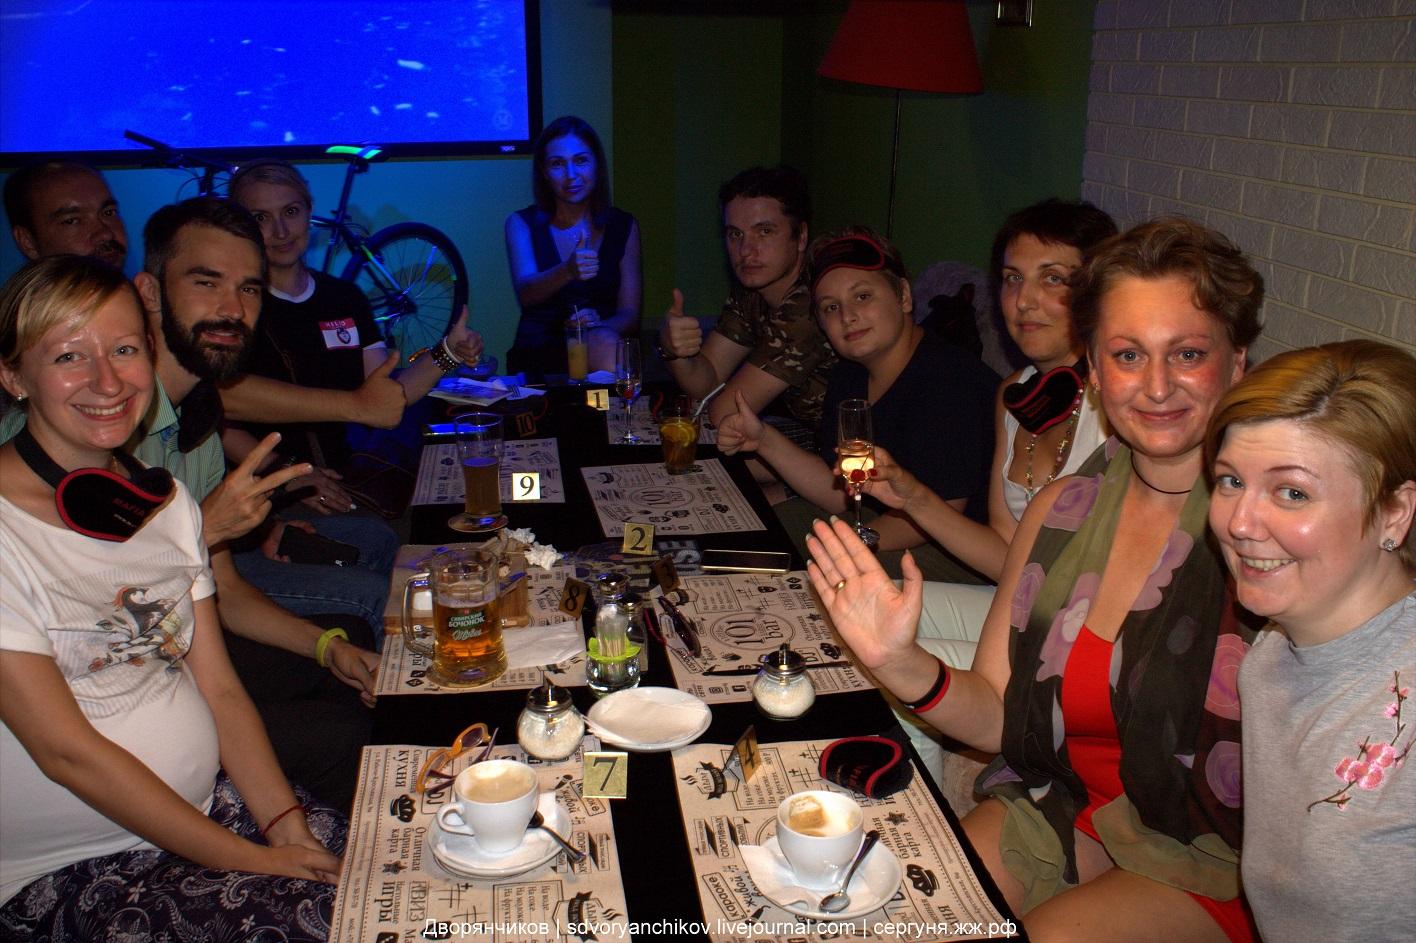 Лаунж бар 101 удовольствие - Волгоград